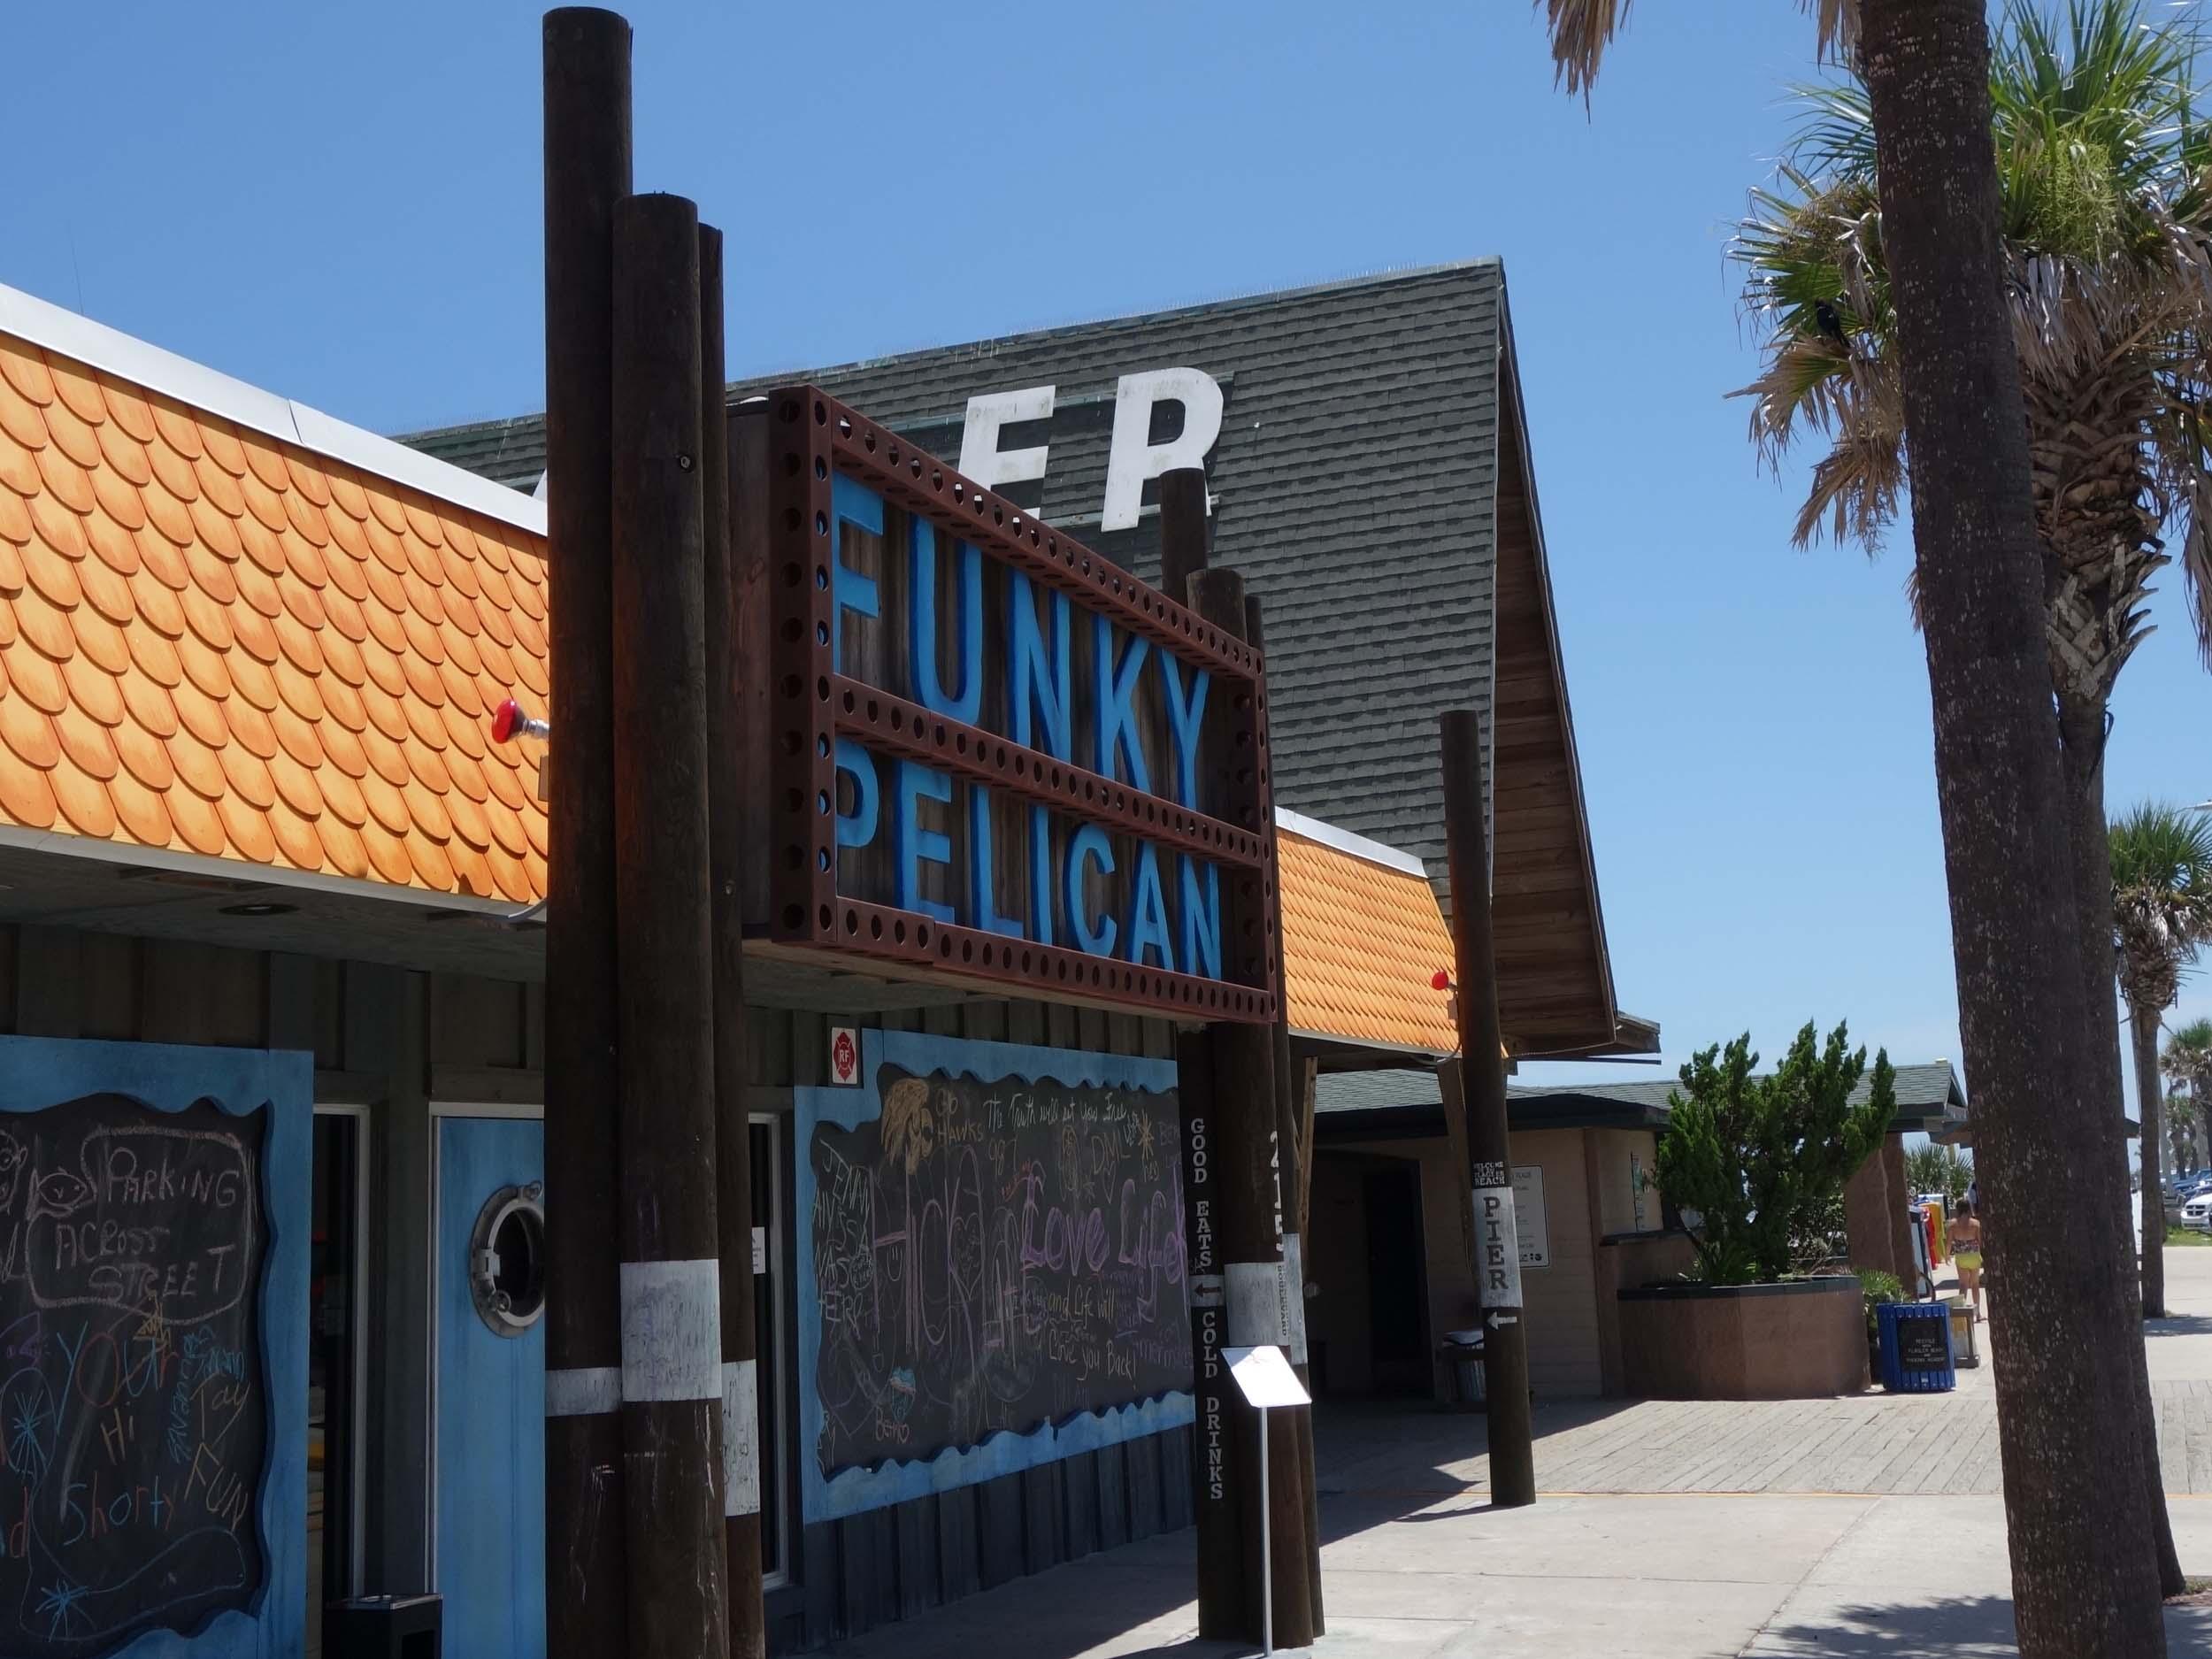 Funky Pelican Entrance